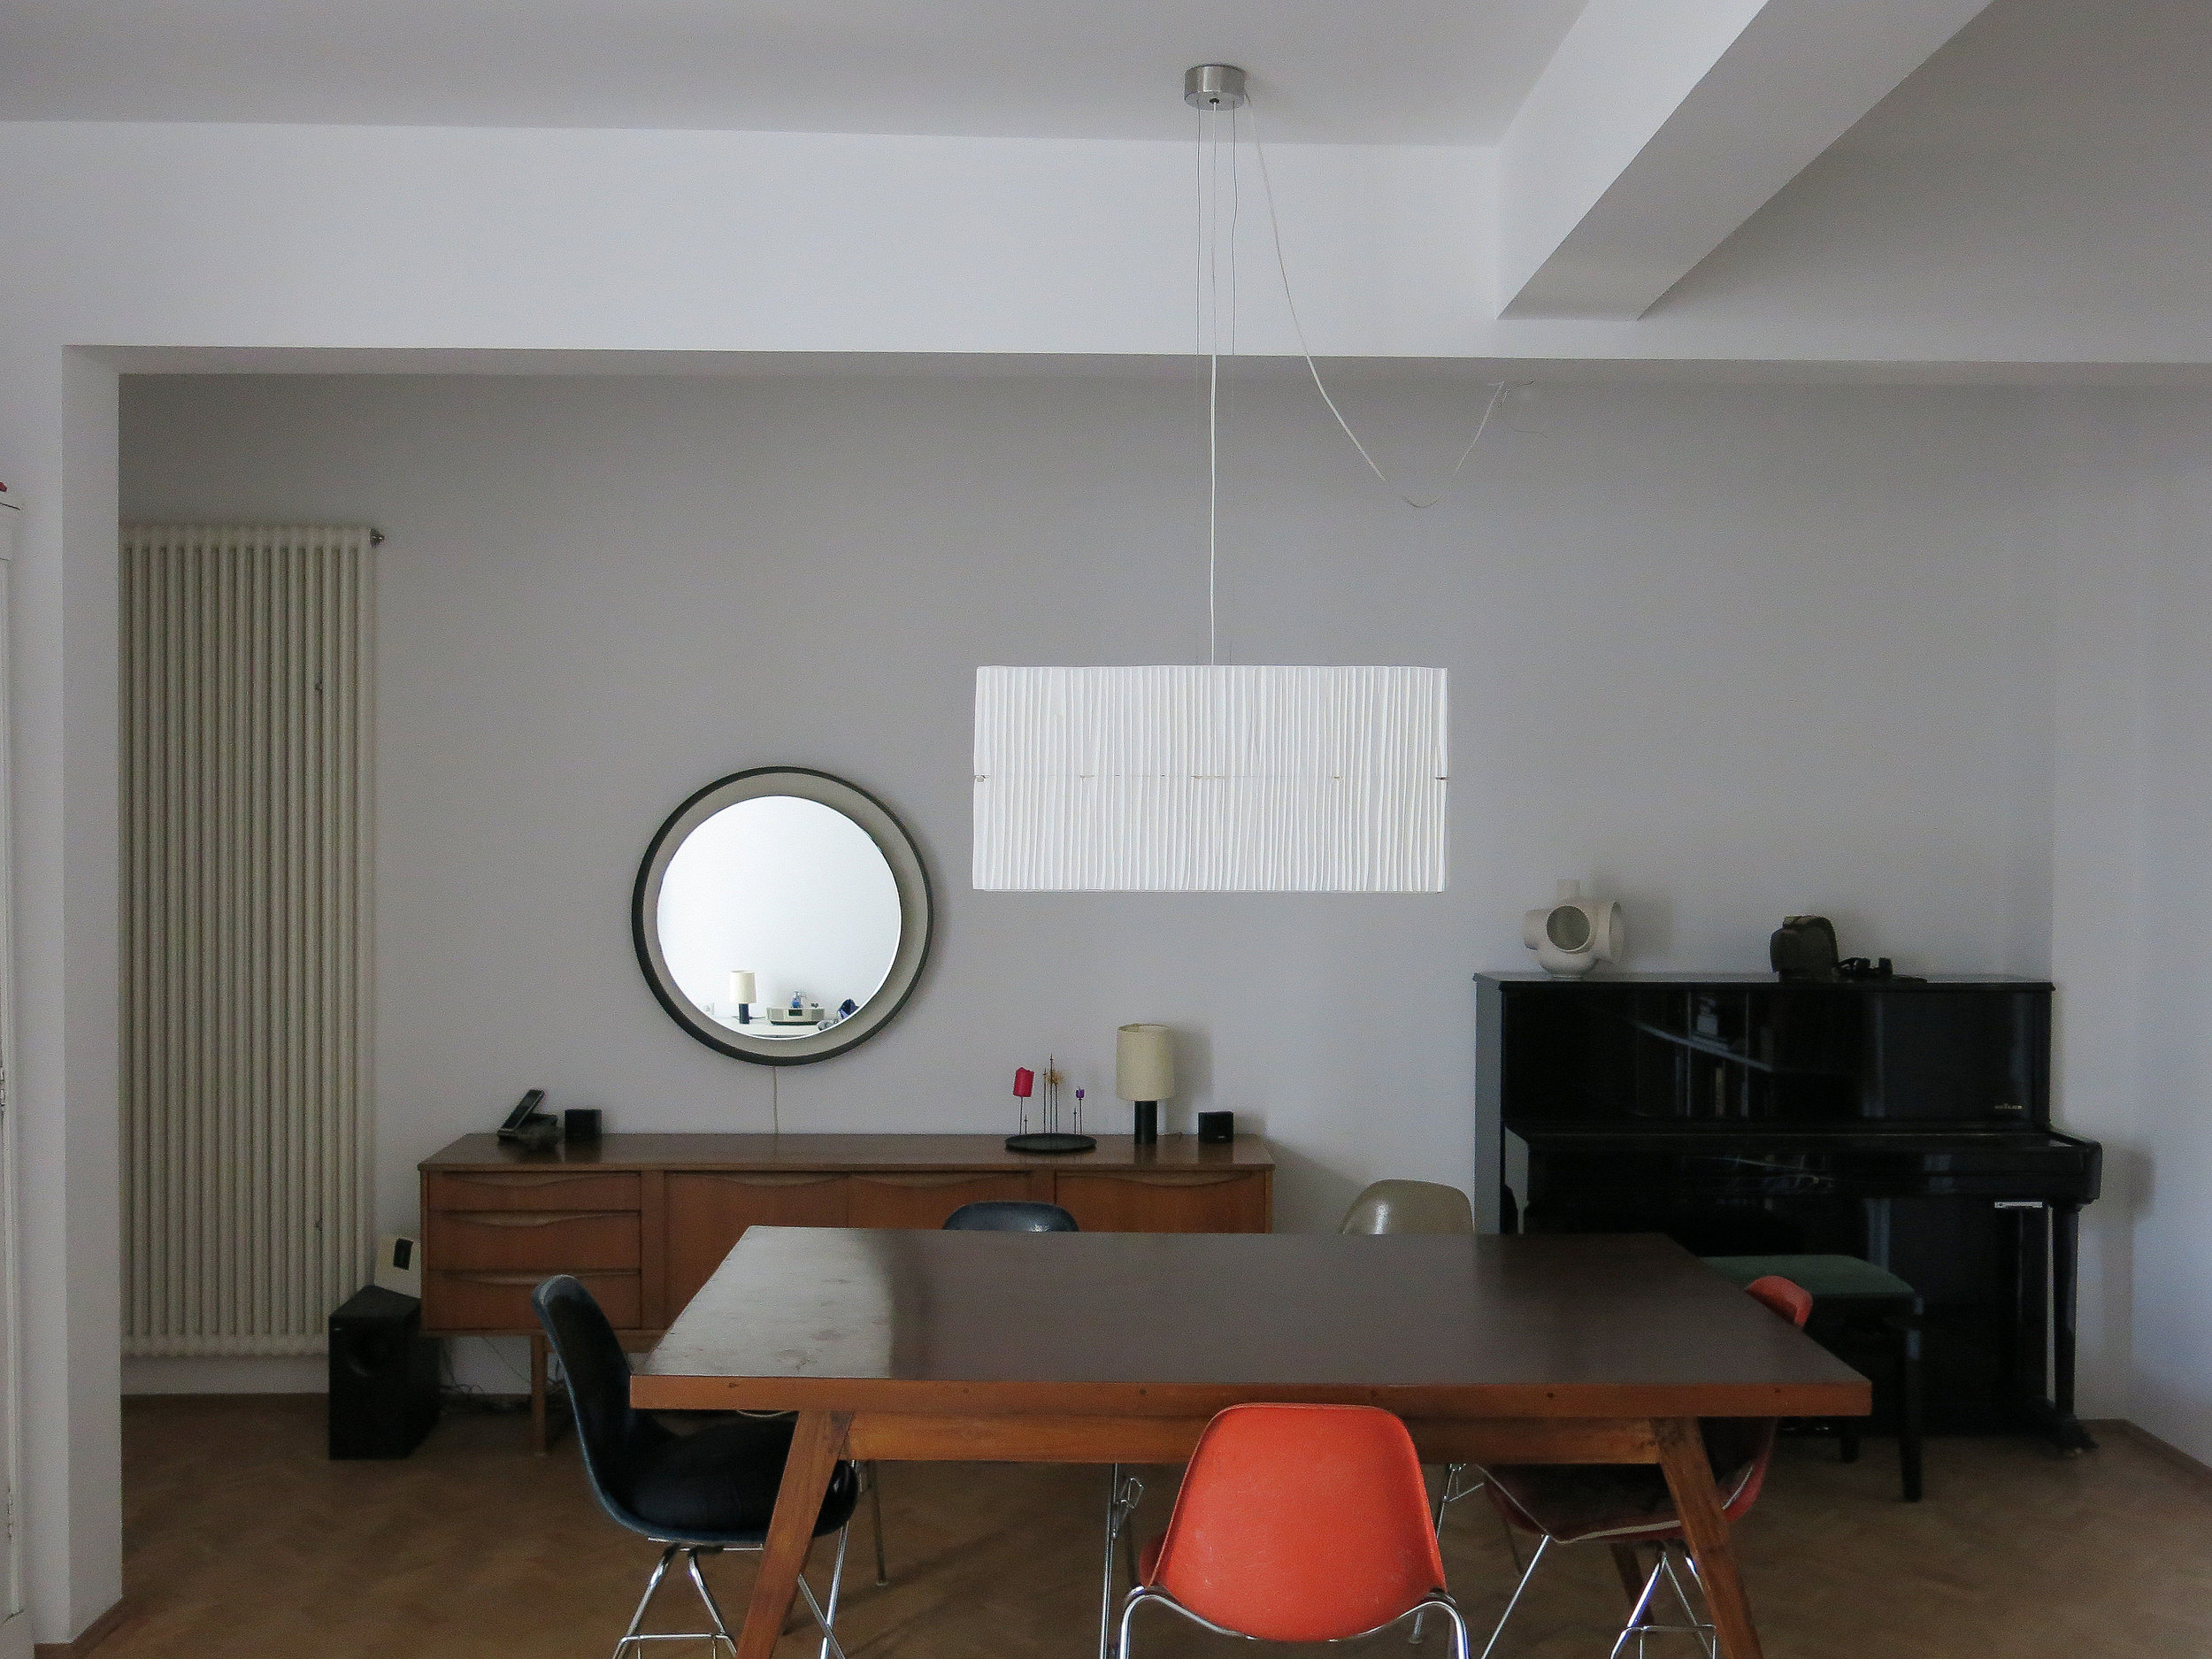 Korinna-fishbox-front-quer-more-room-unlit-IMG_0428.jpg